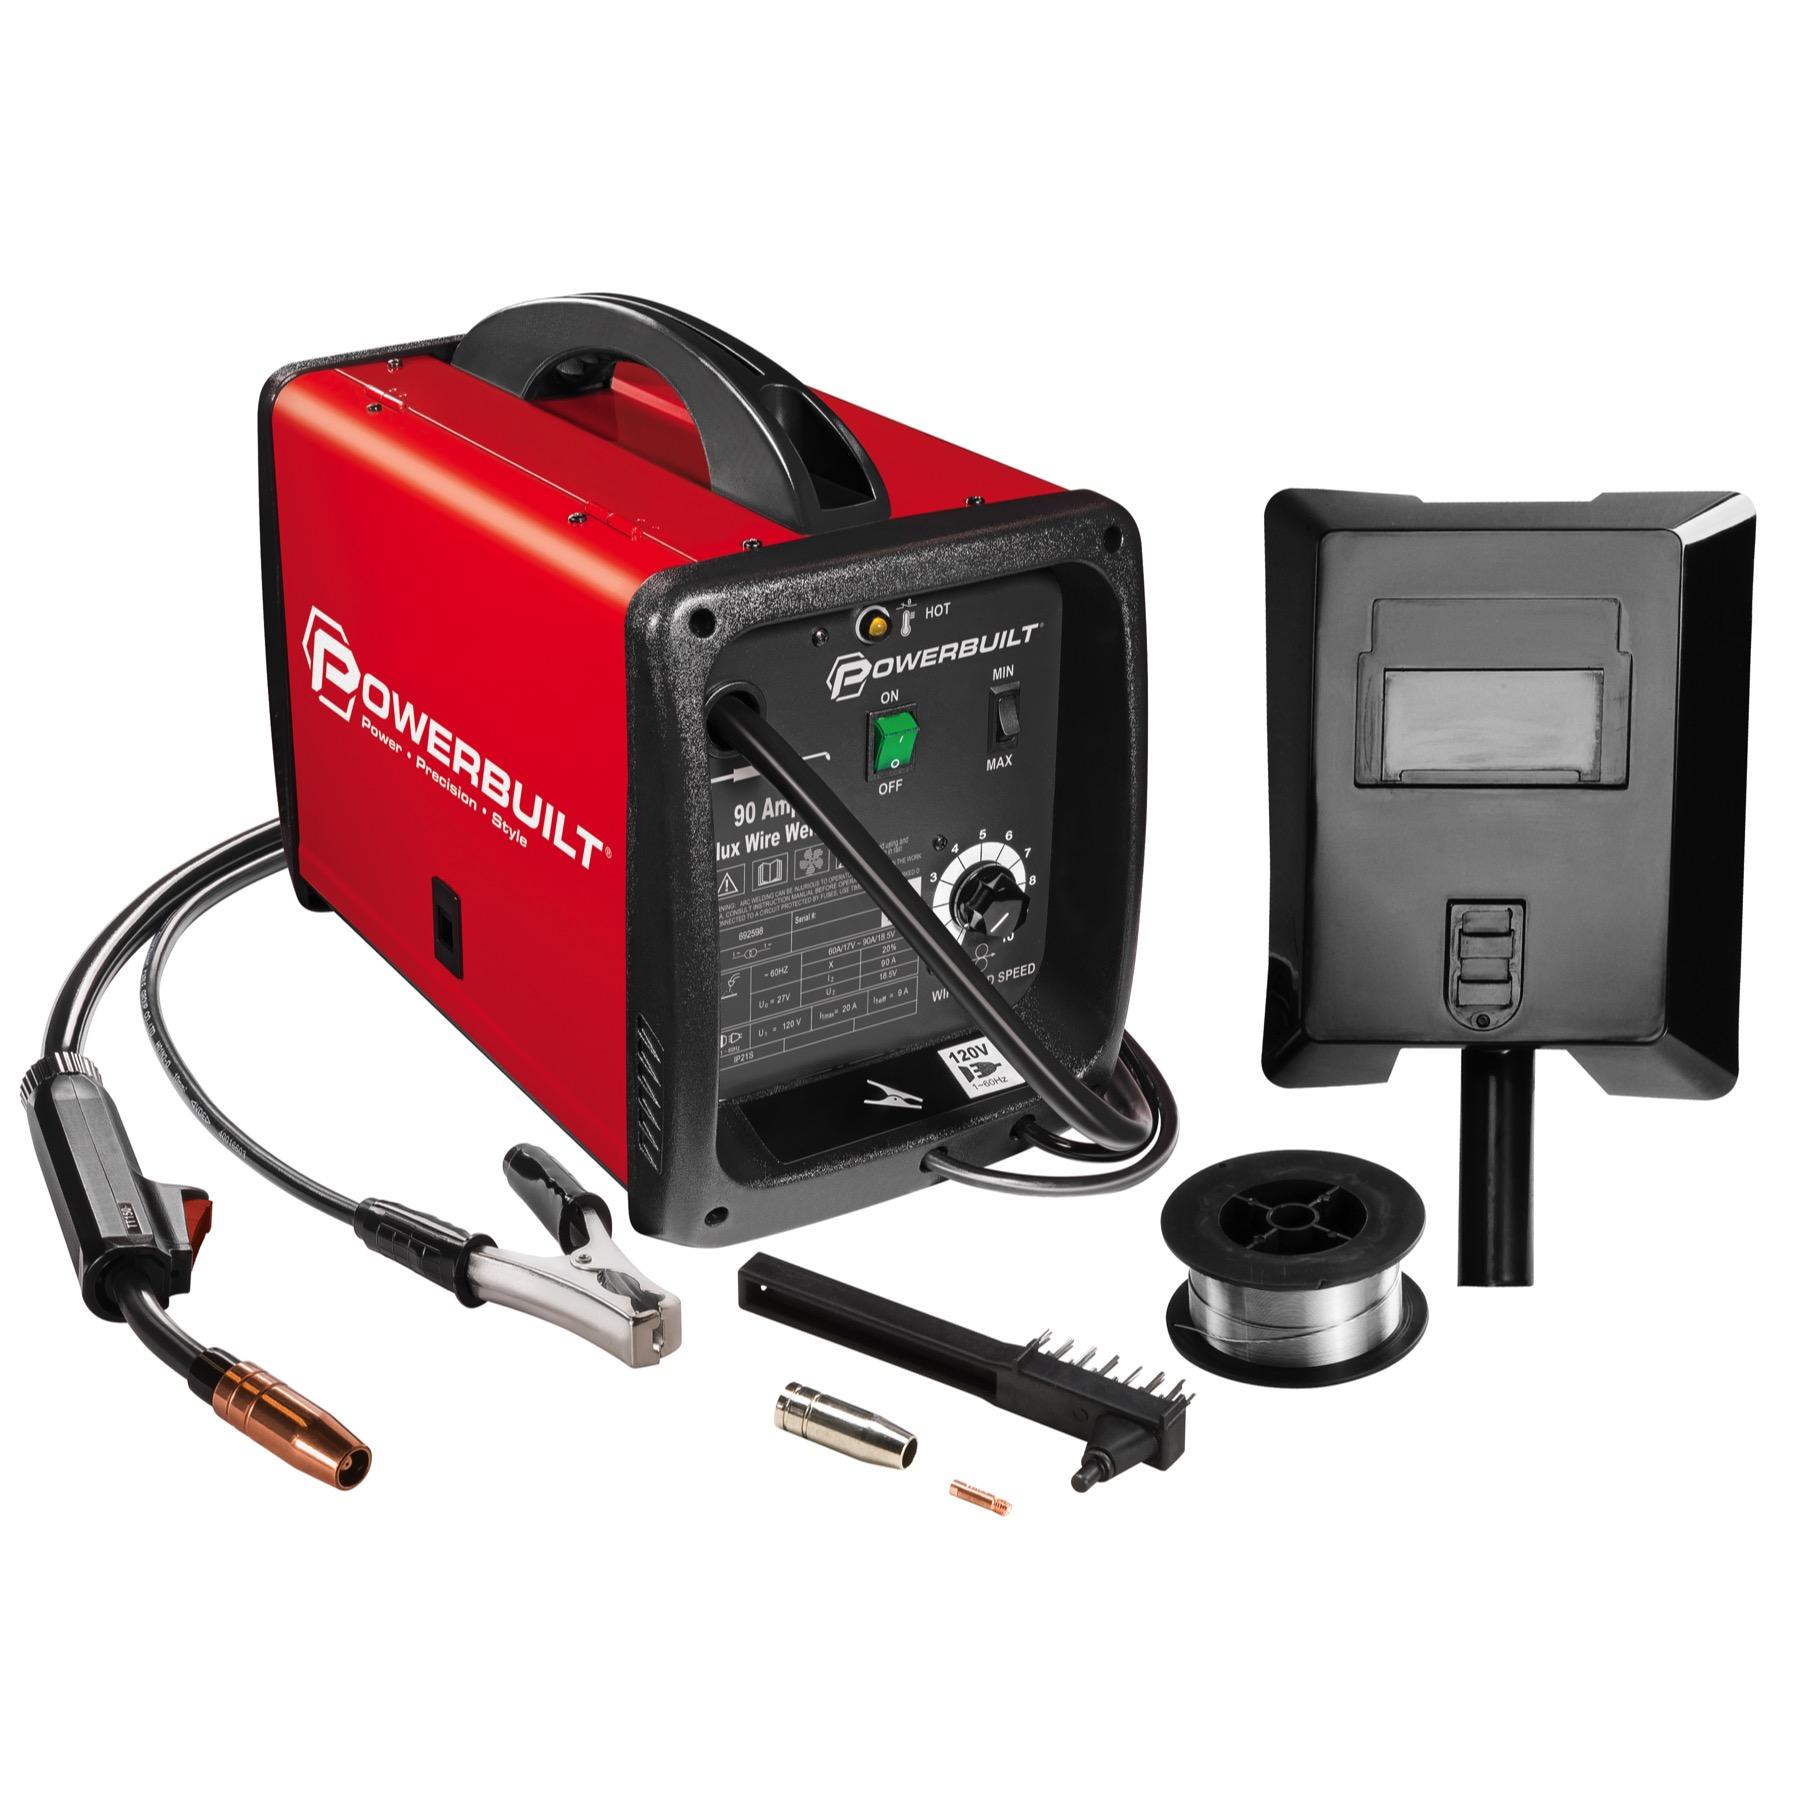 Powerbuilt Mig 90 Amp Flux Core Wire Feed Welder Compact - 240032 ...